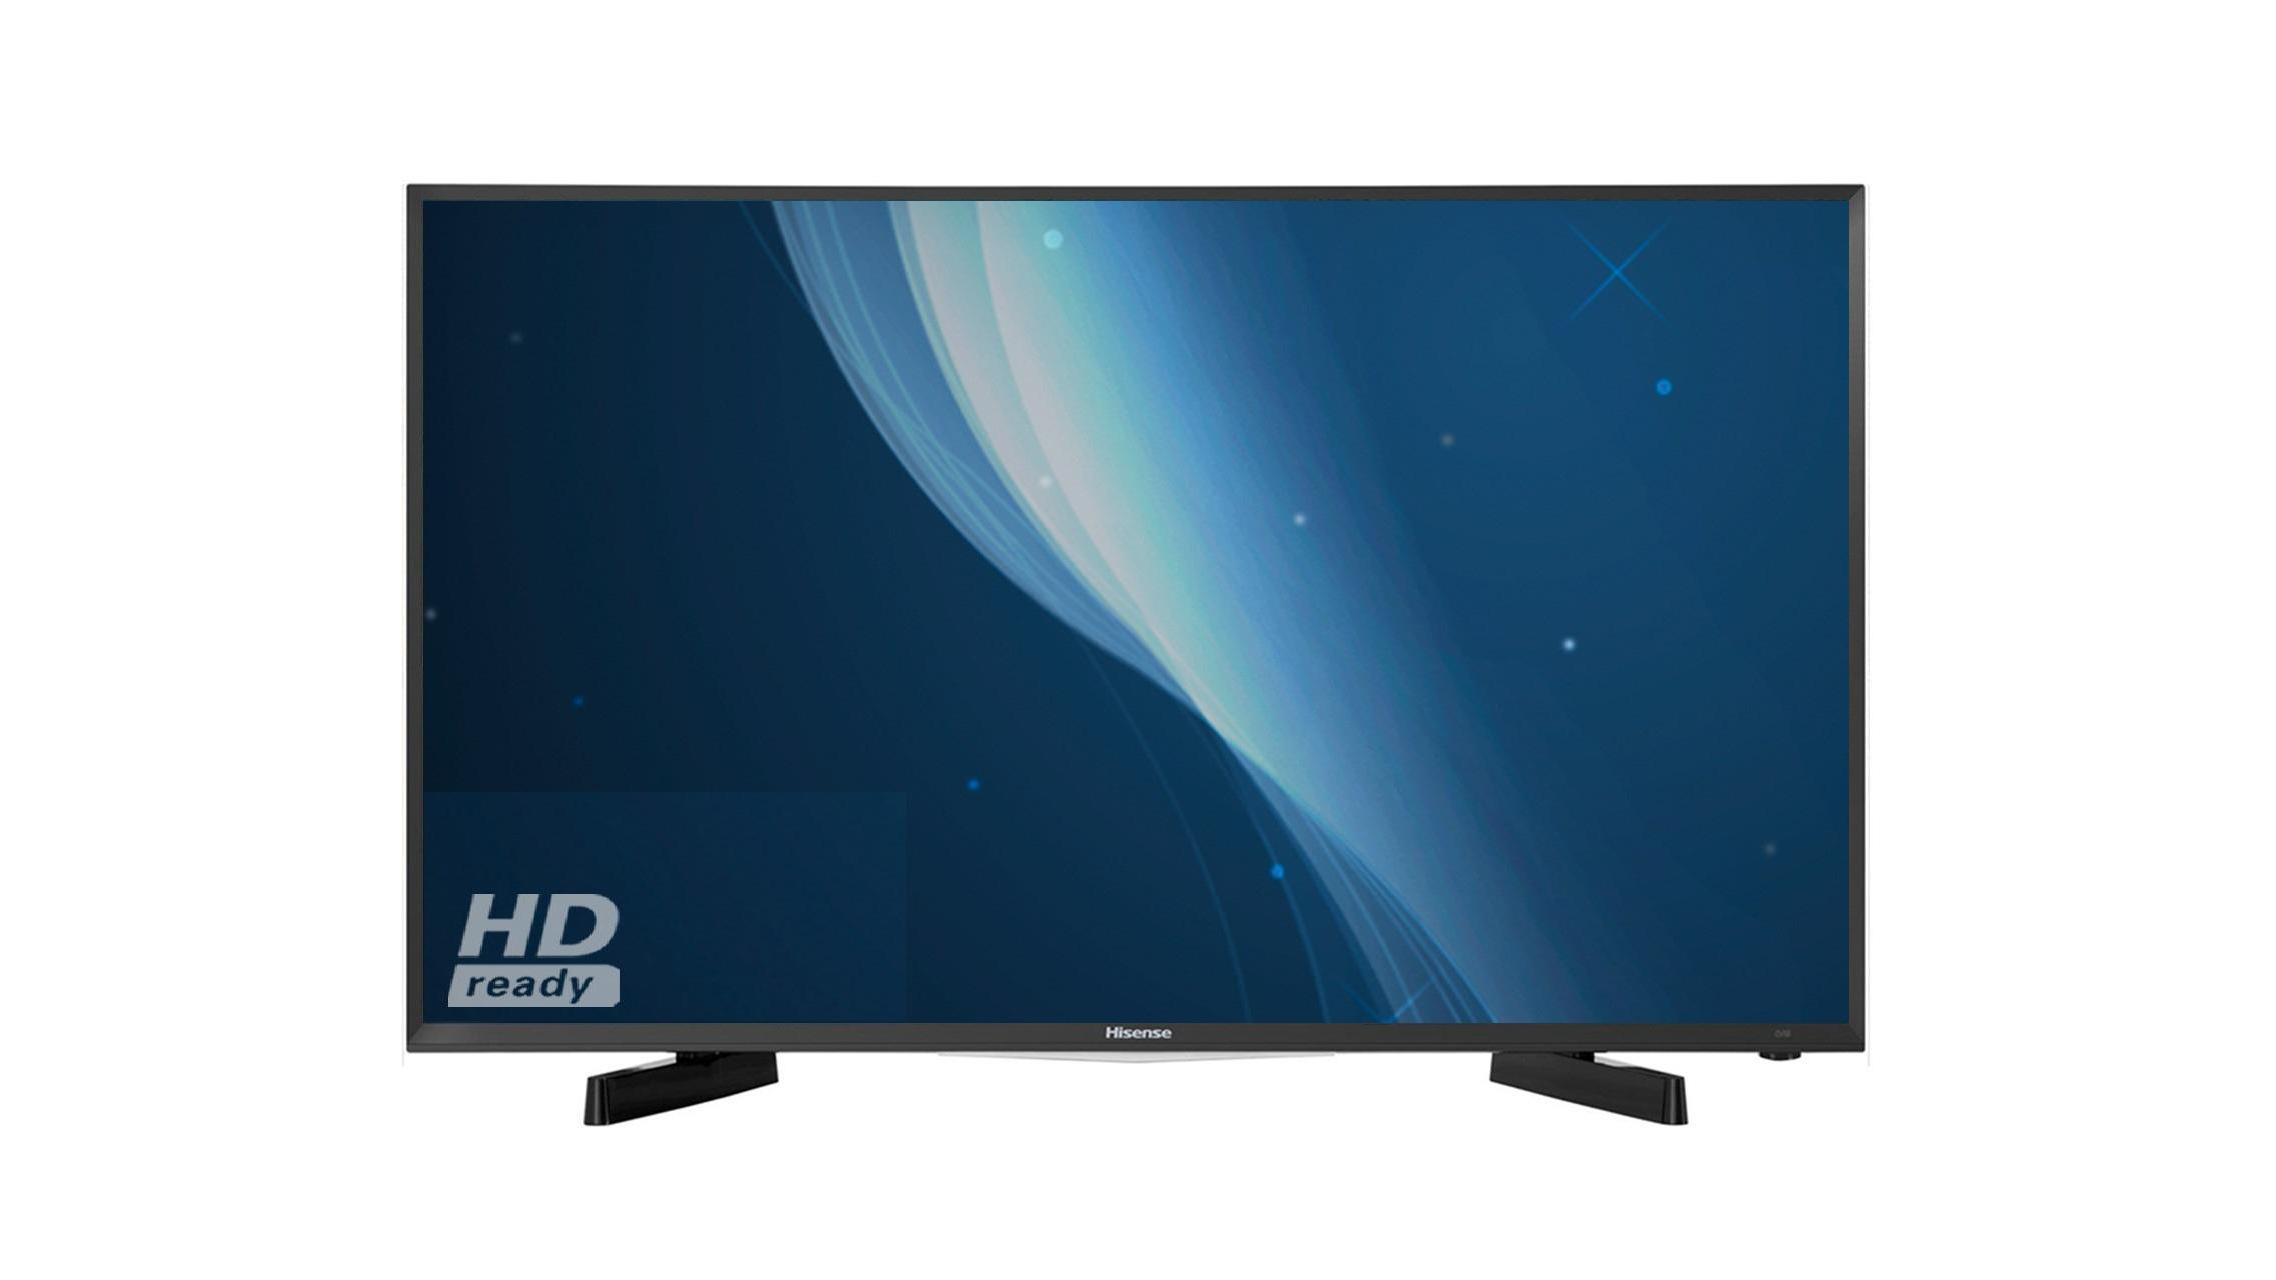 Hisense H32M2600 32-inch TV review | TechRadar